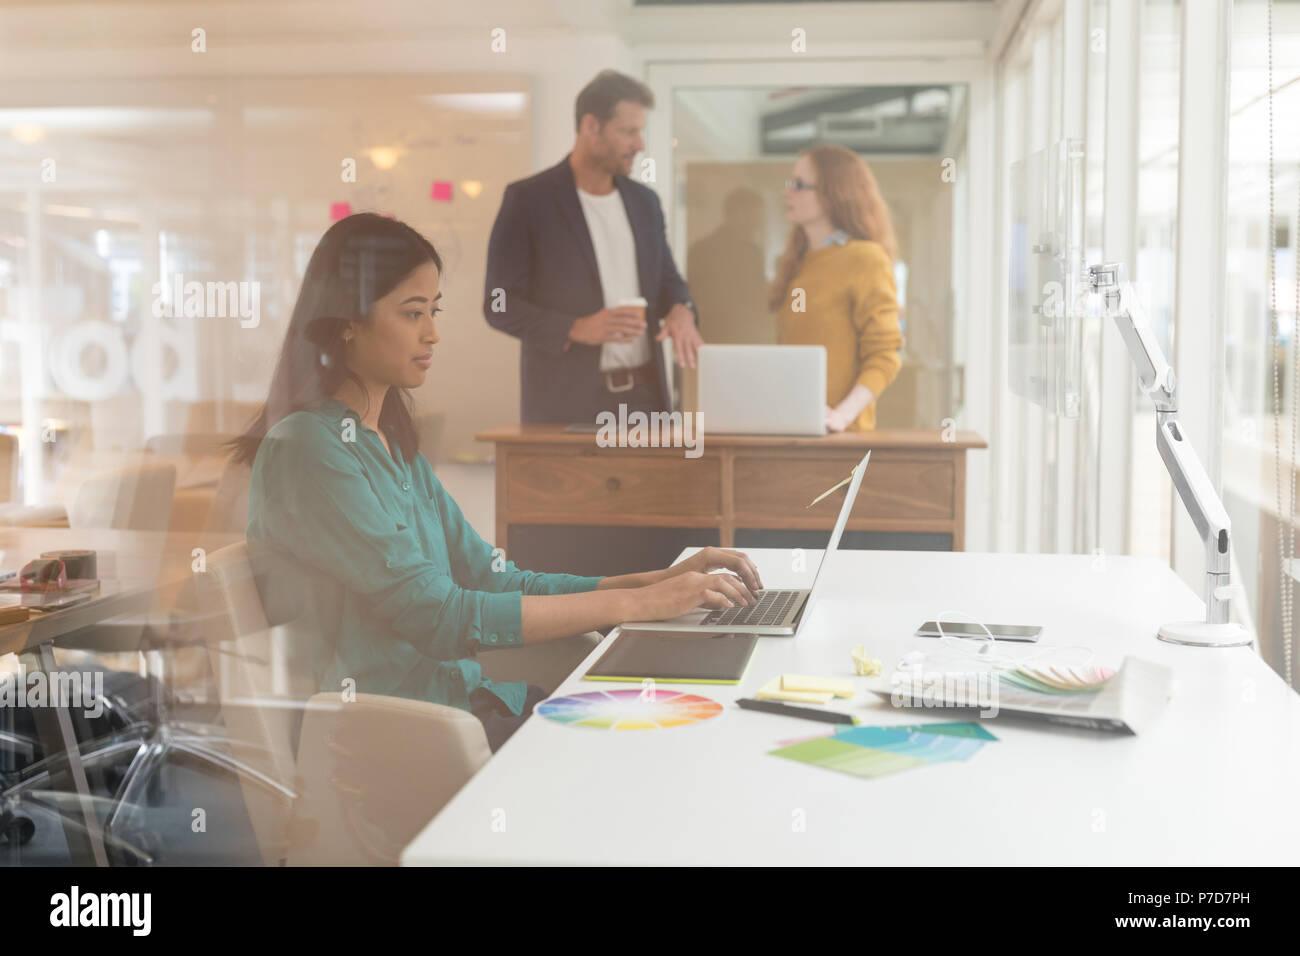 Female graphic designer using laptop at desk - Stock Image